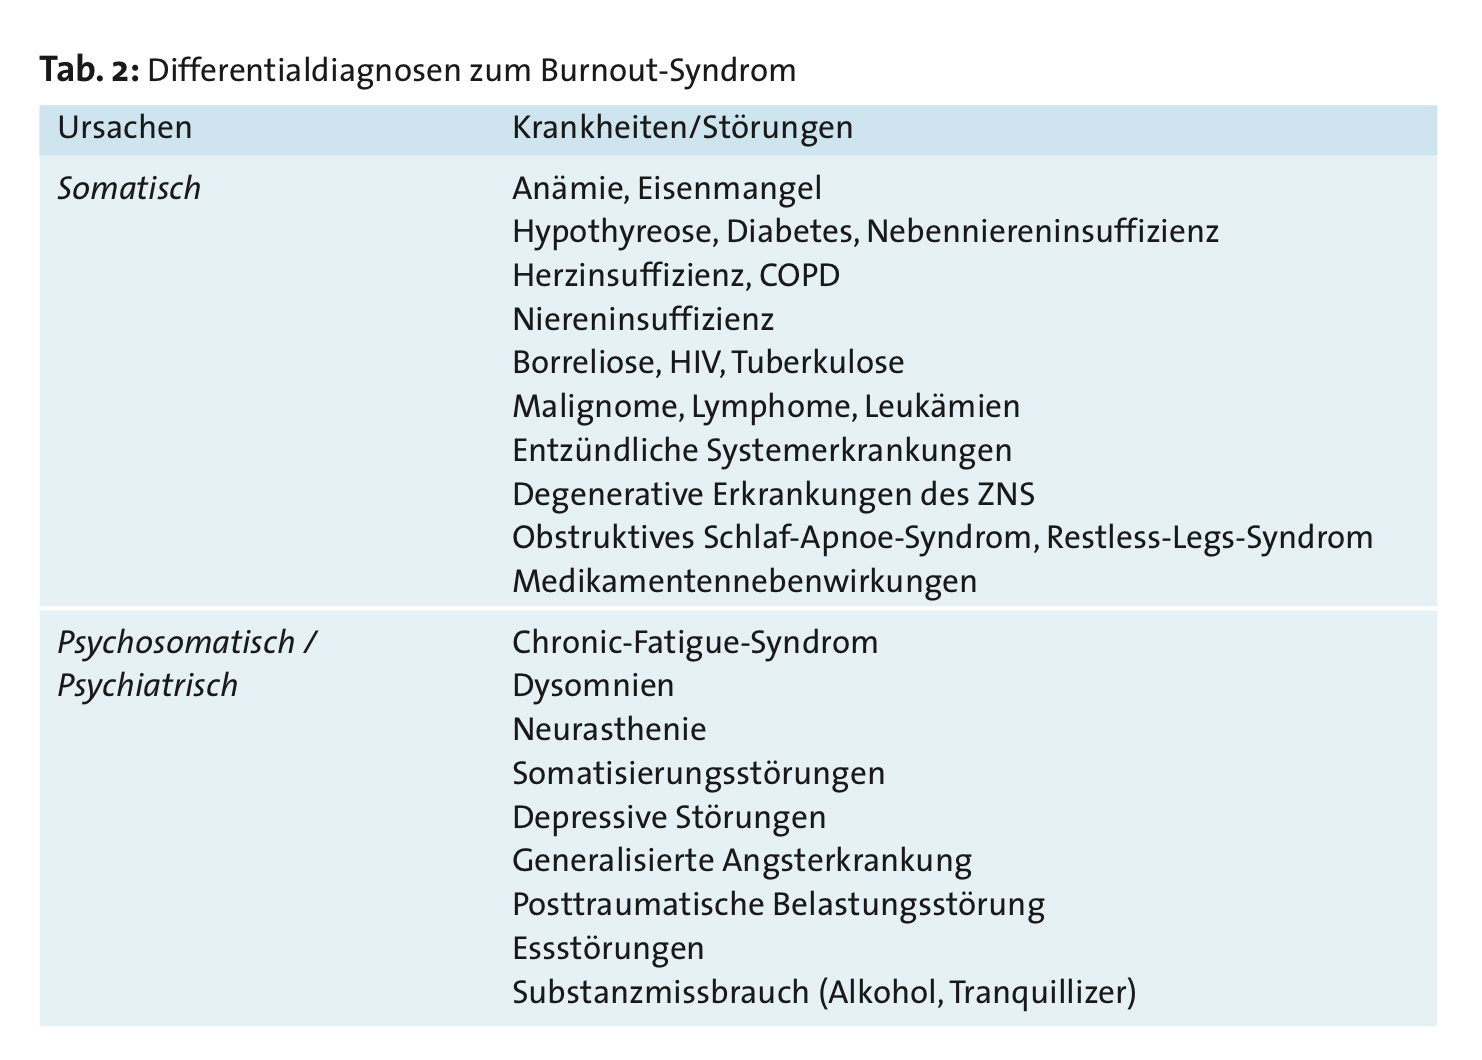 differentialdiagnose_burnout